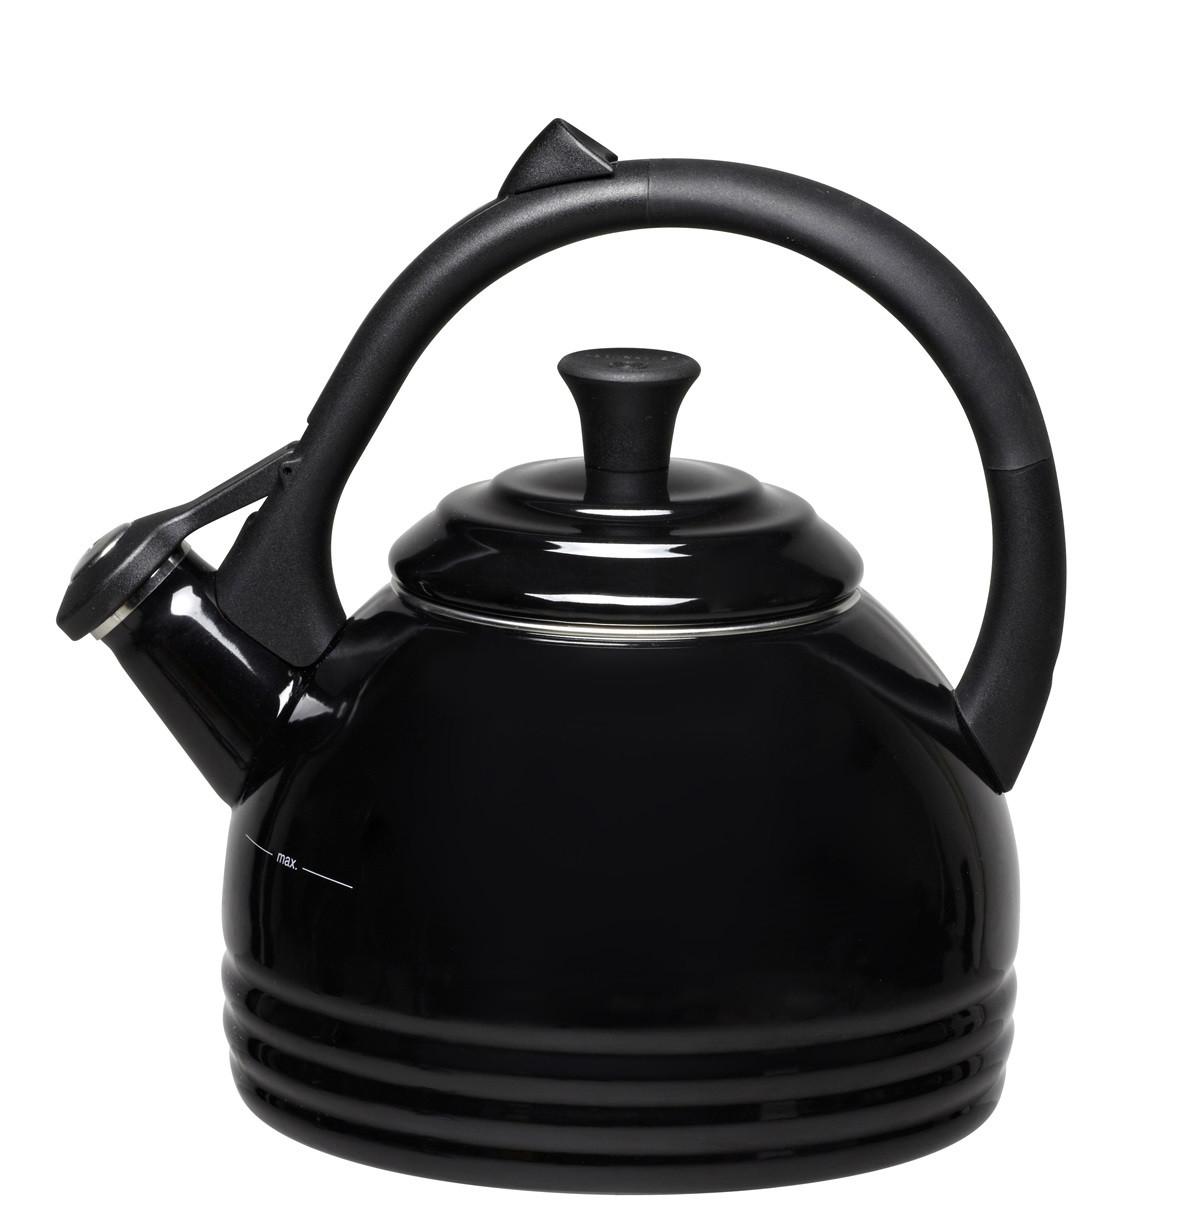 Le Creuset Wasserkessel Drop 1,6 l schwarz